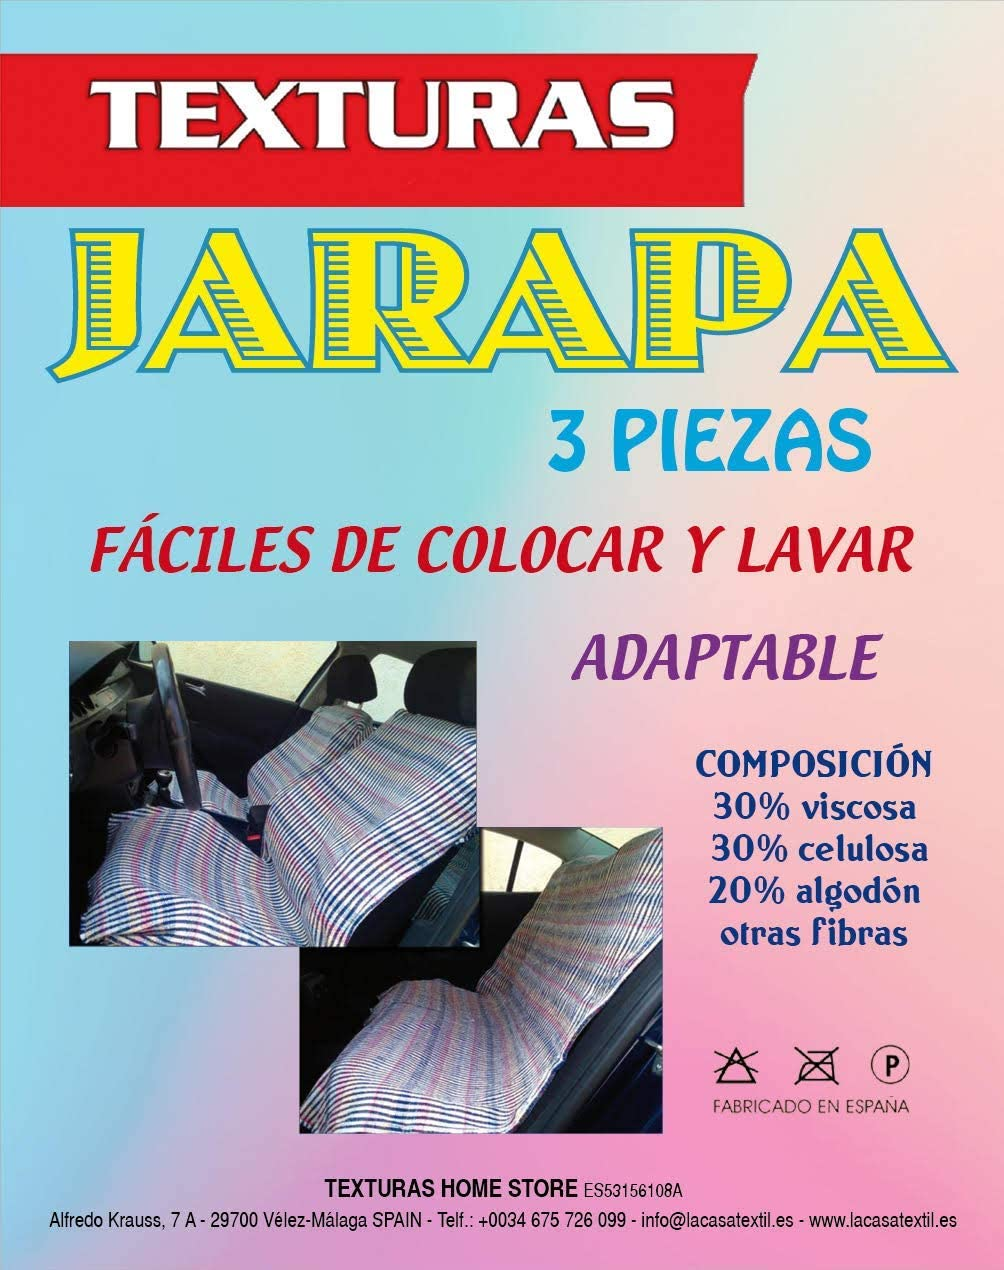 TEXTURAS HOME Set of 3 Harapas Classic Car